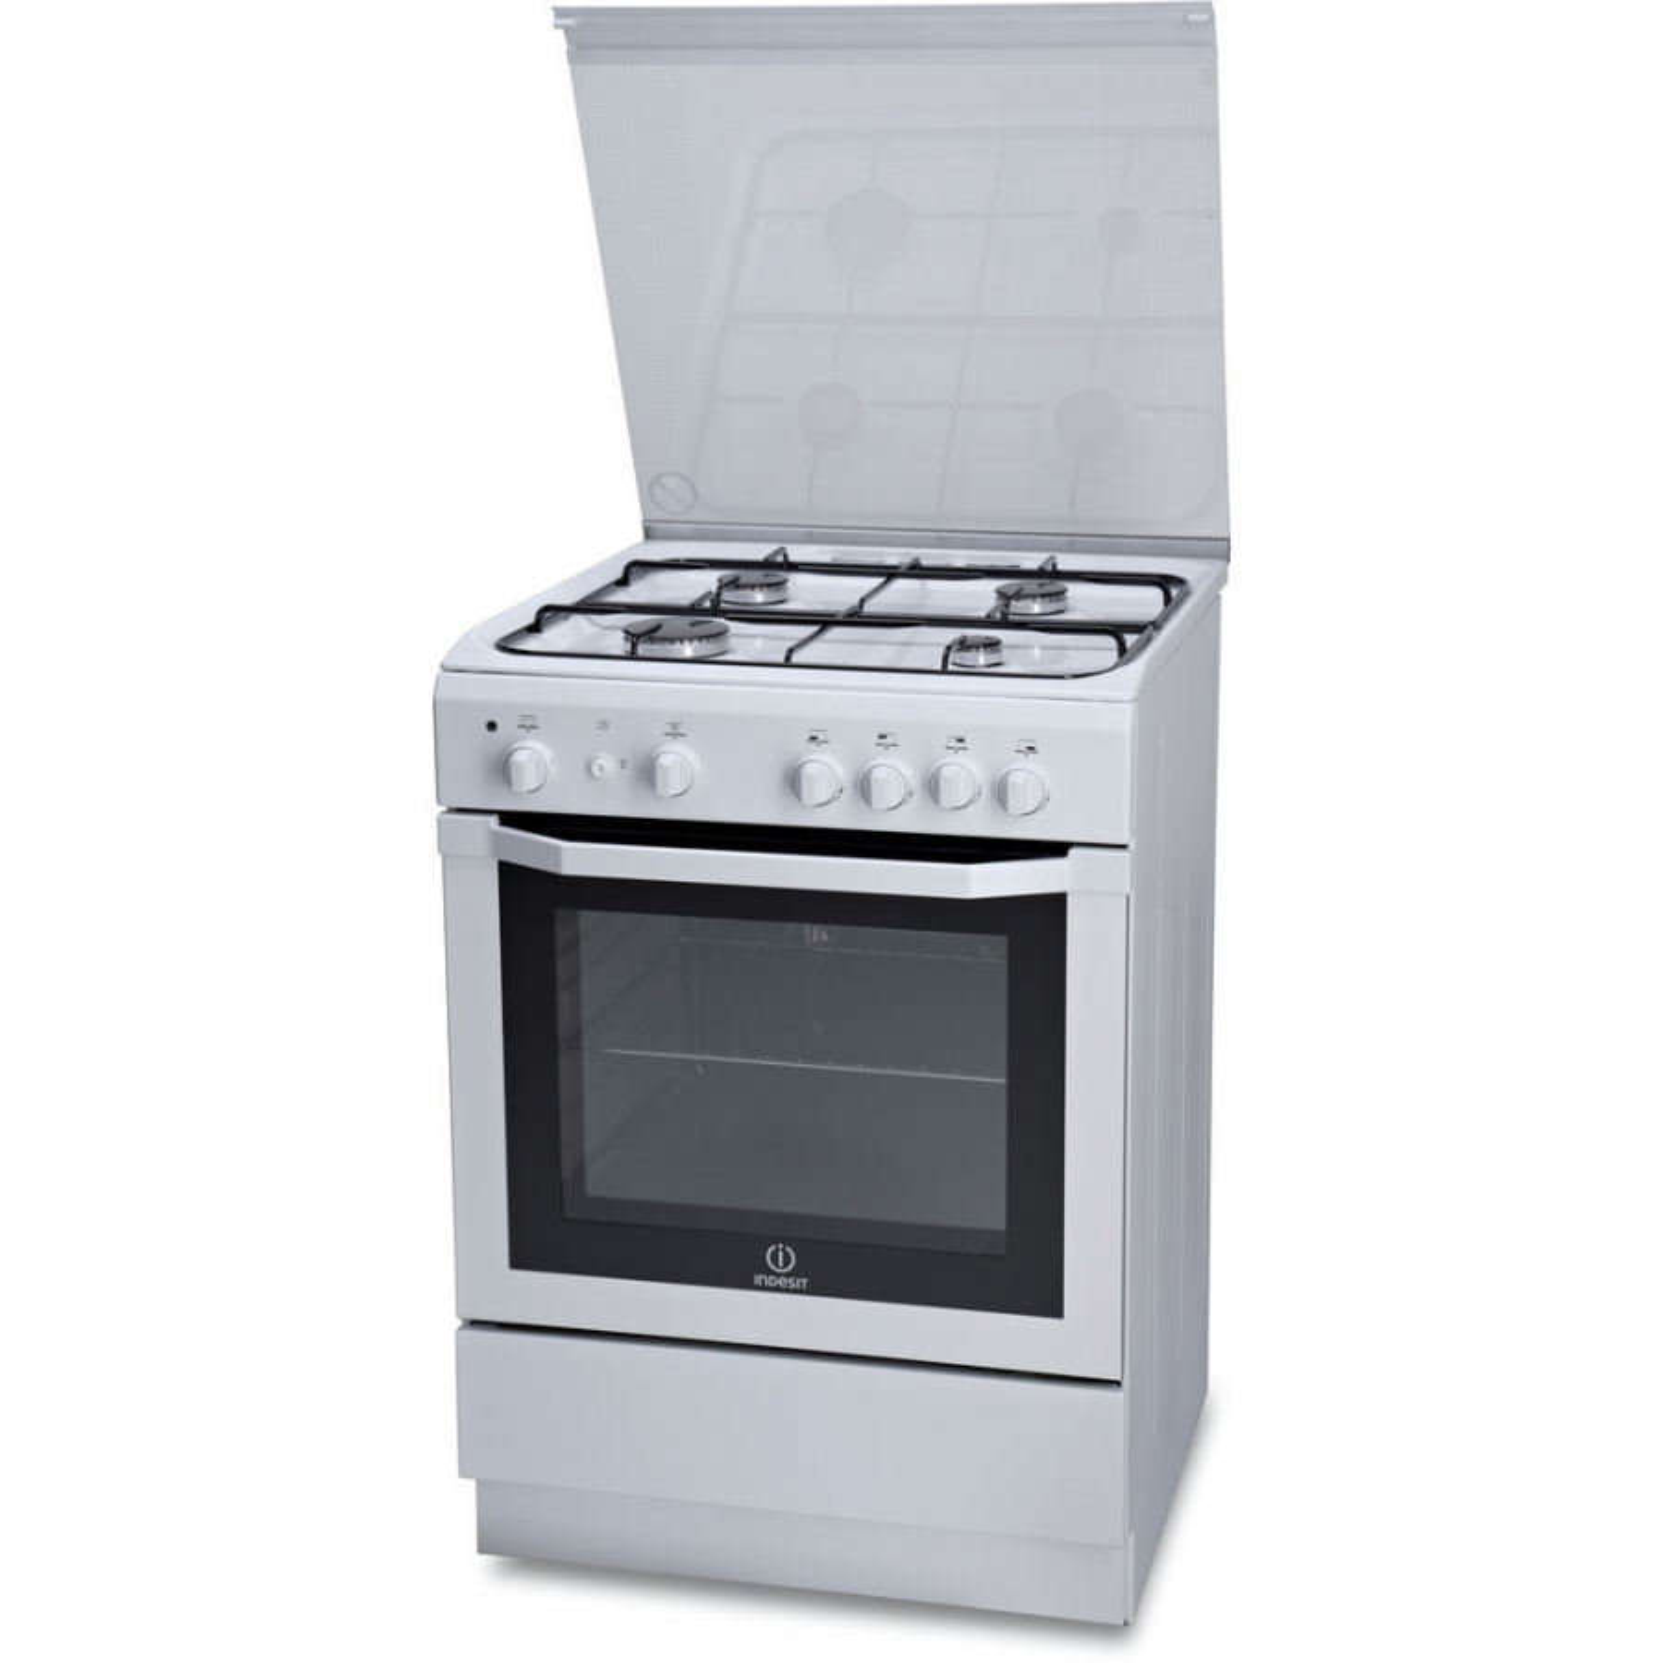 Cucina indesit i6gg1f 1 w i bianca 60x60 4 fuochi forno a for Cucina 6 fuochi zanussi usata